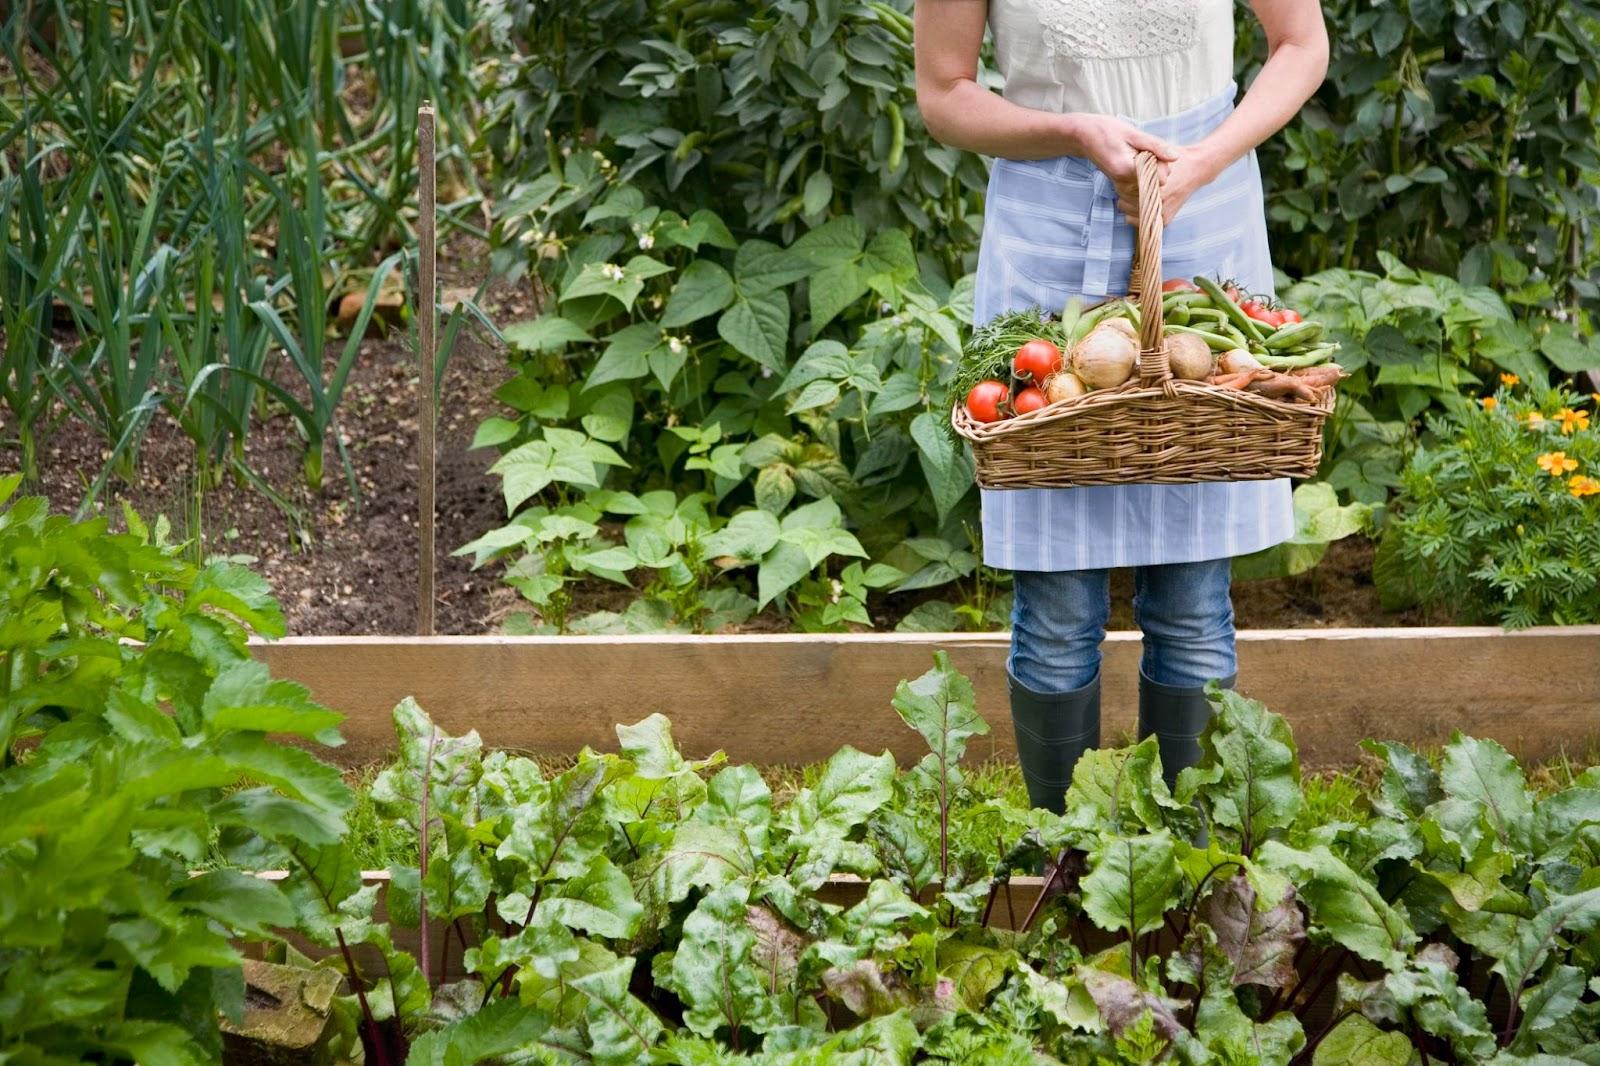 Panen buah dan sayur